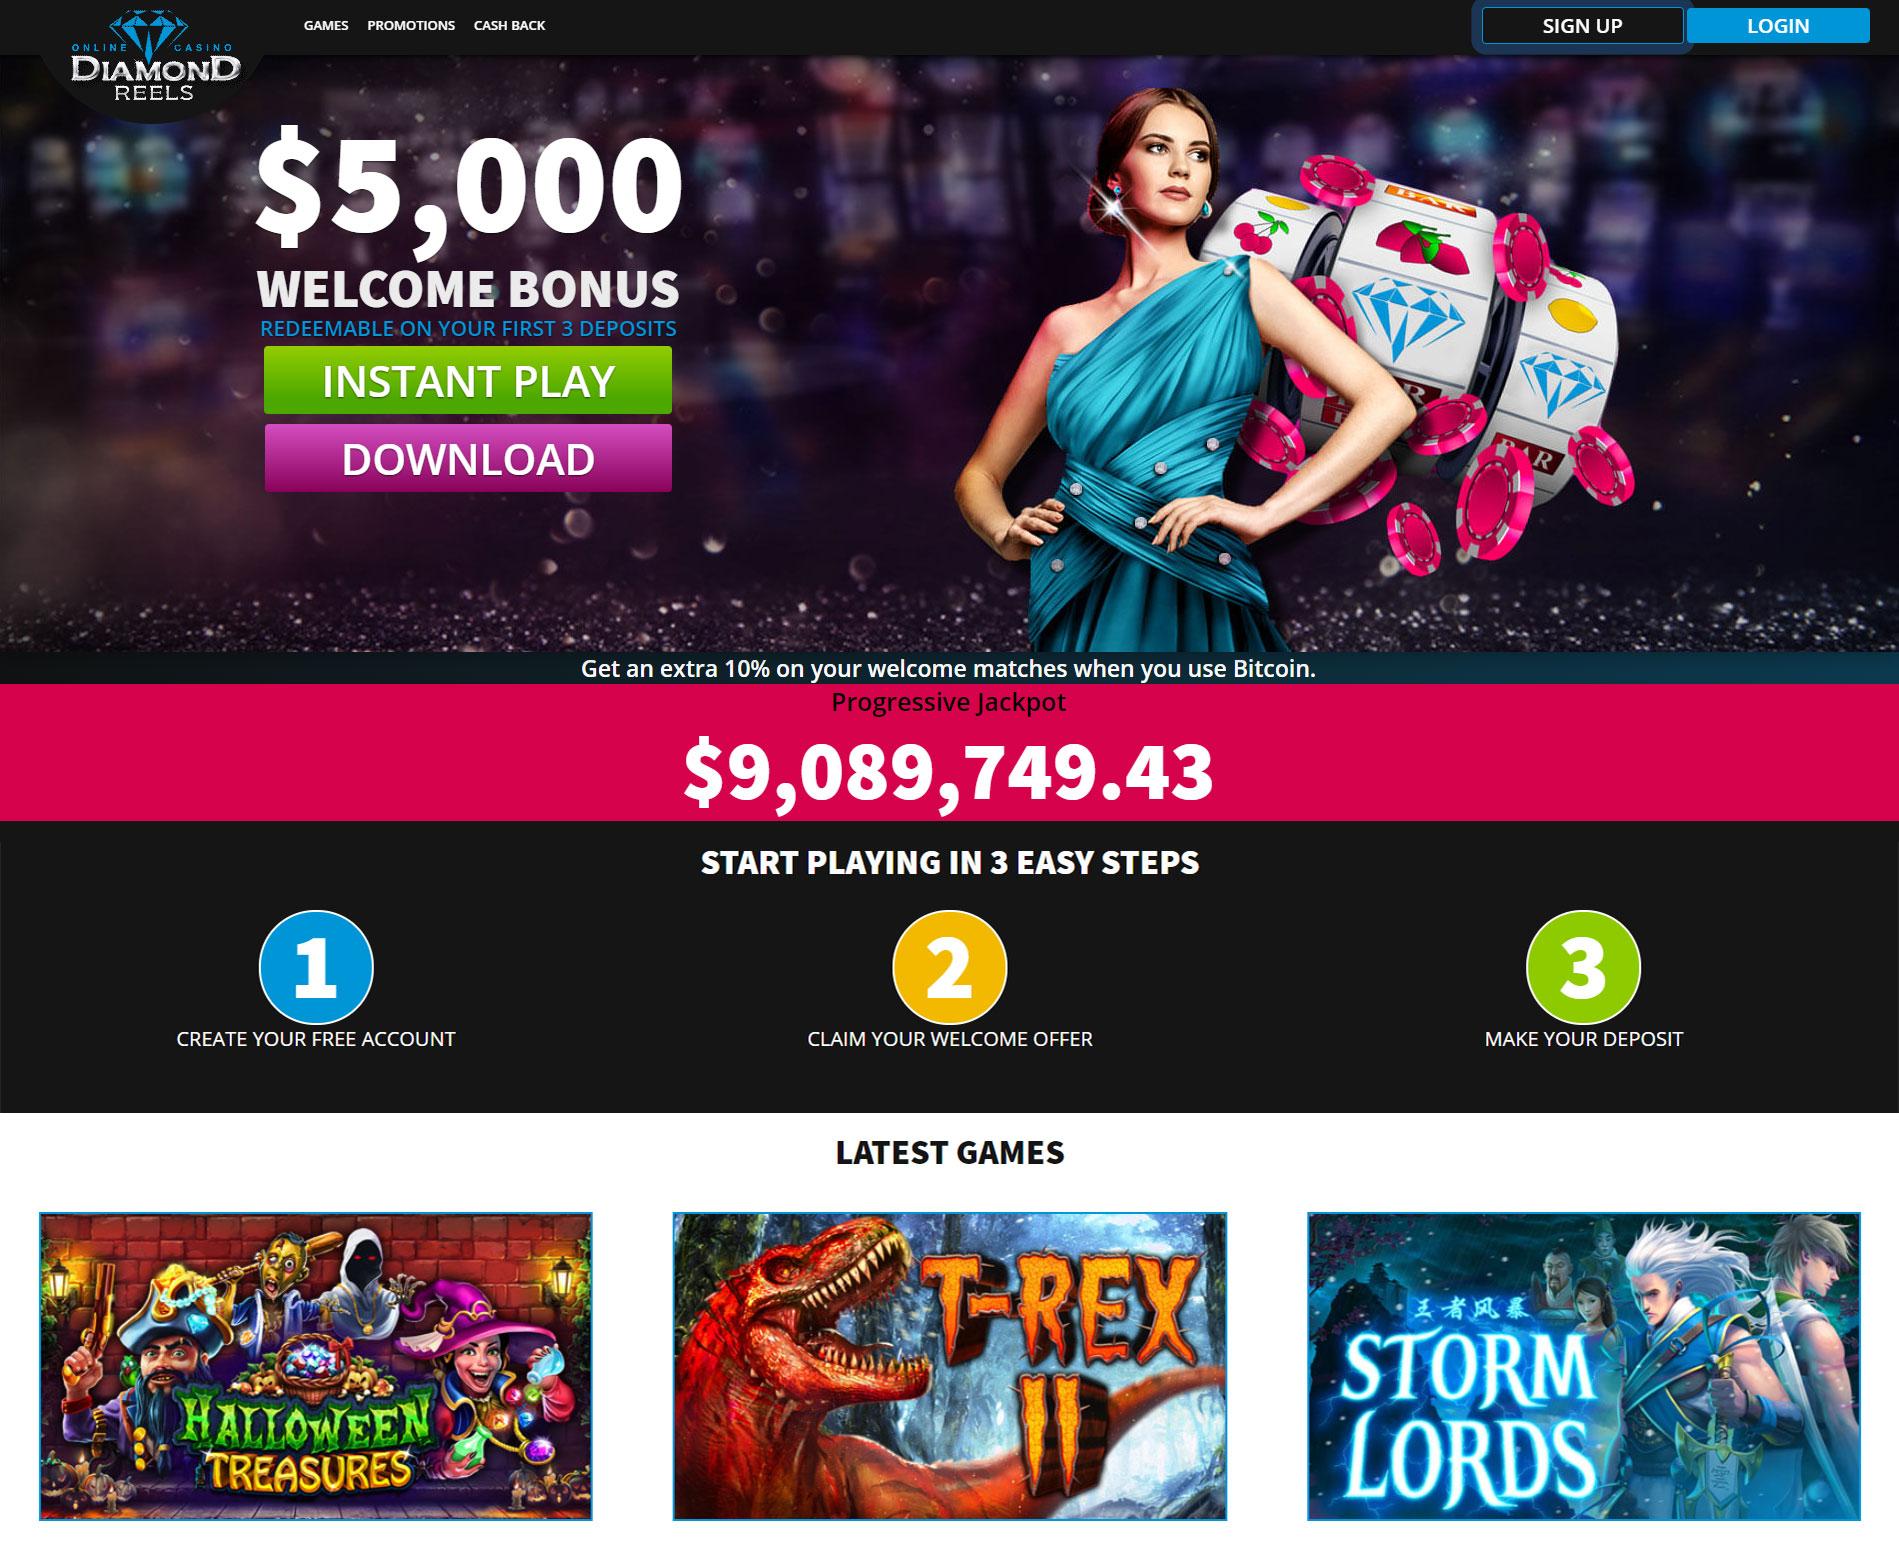 Diamond Reels Casino No Deposit Bonus Codes 75 Free Spins